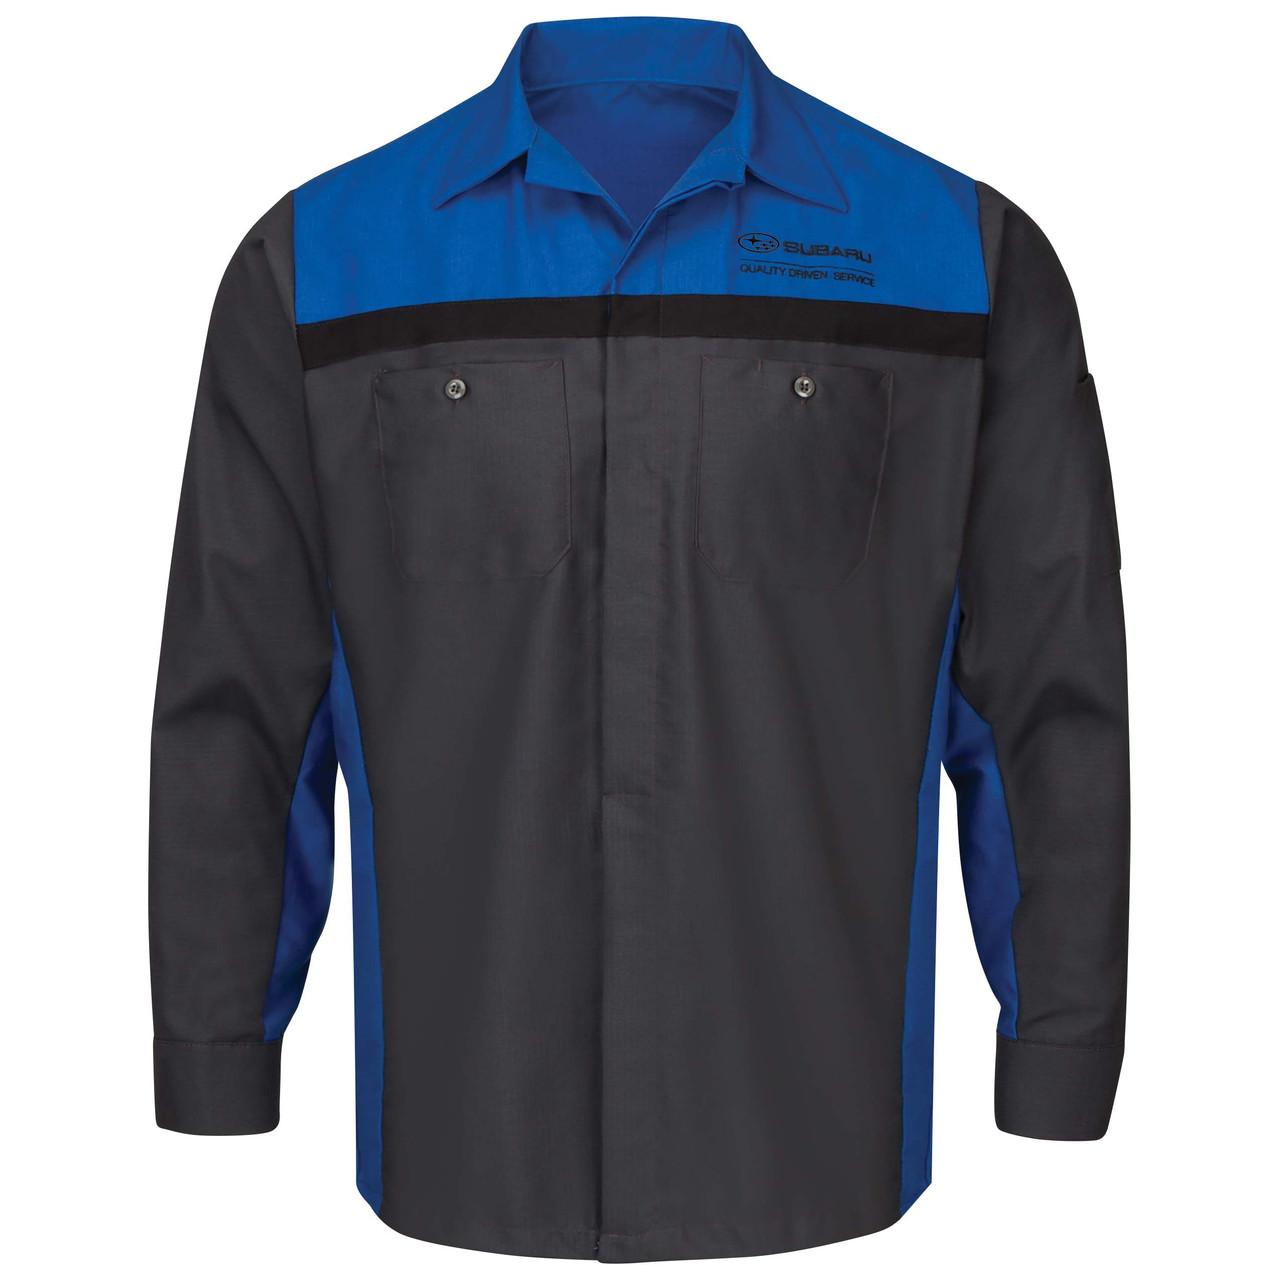 Subaru automotive tech shirt by Red Kap